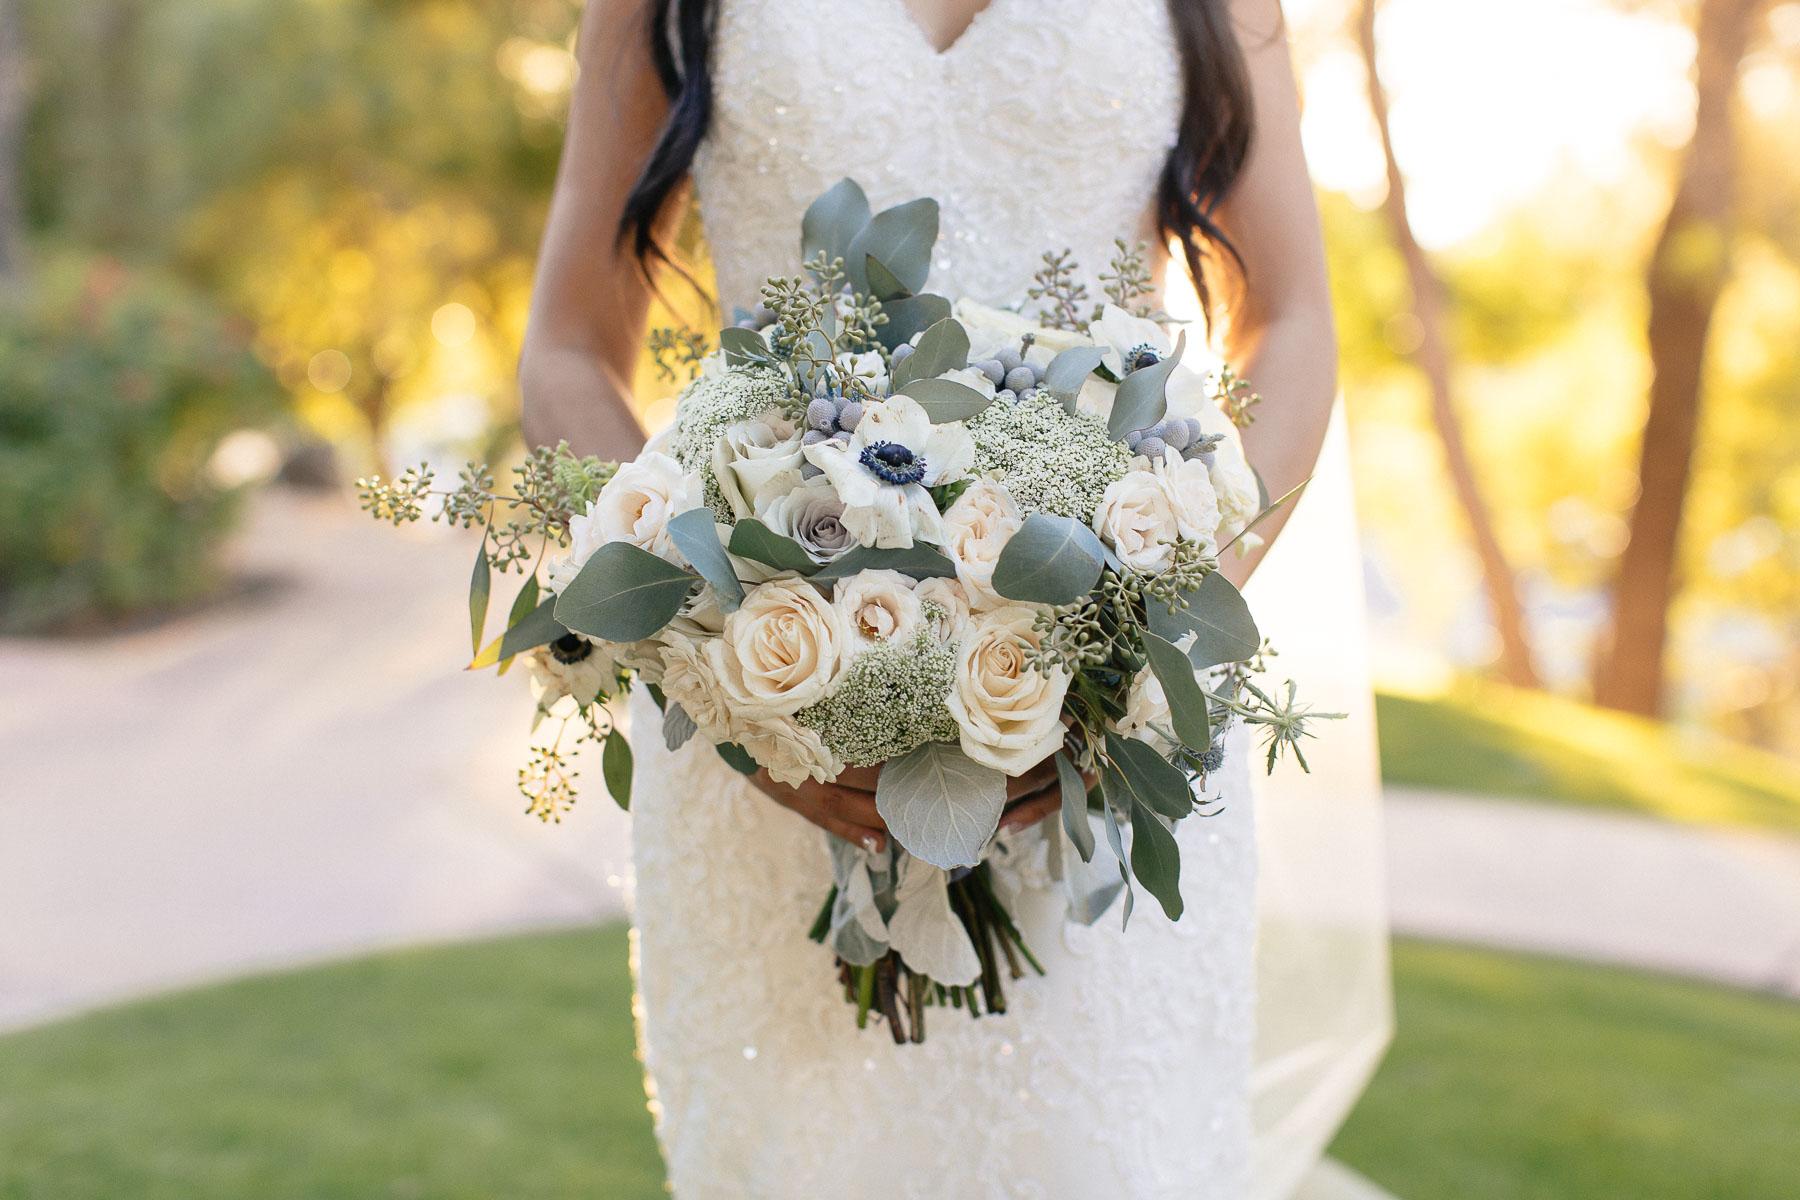 161029-Luxium-Weddings-Arizona-Jeff-Griselda-First-Look-Val-Vista-Lakes-Gilber-056.jpg